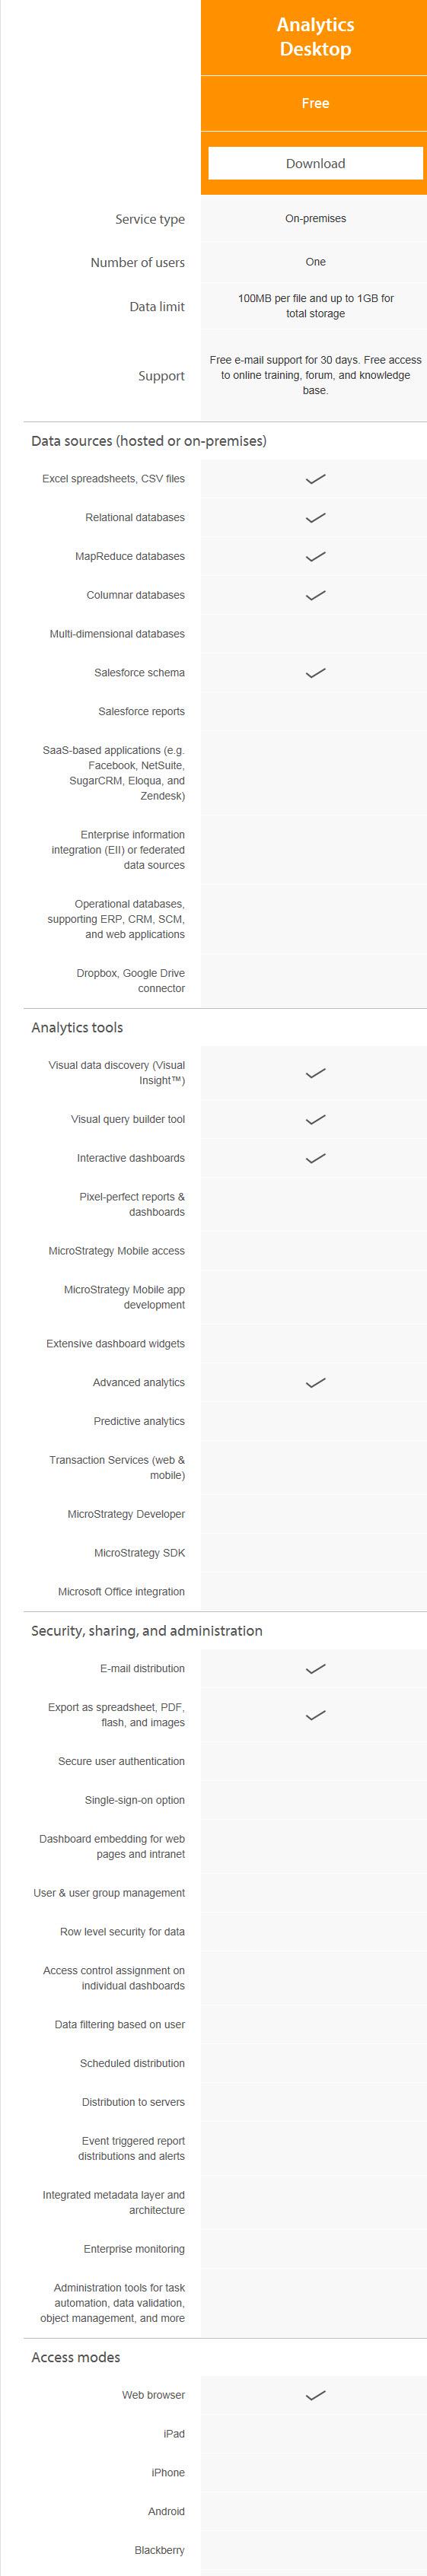 MicroStrategy Analytics Desktop Features